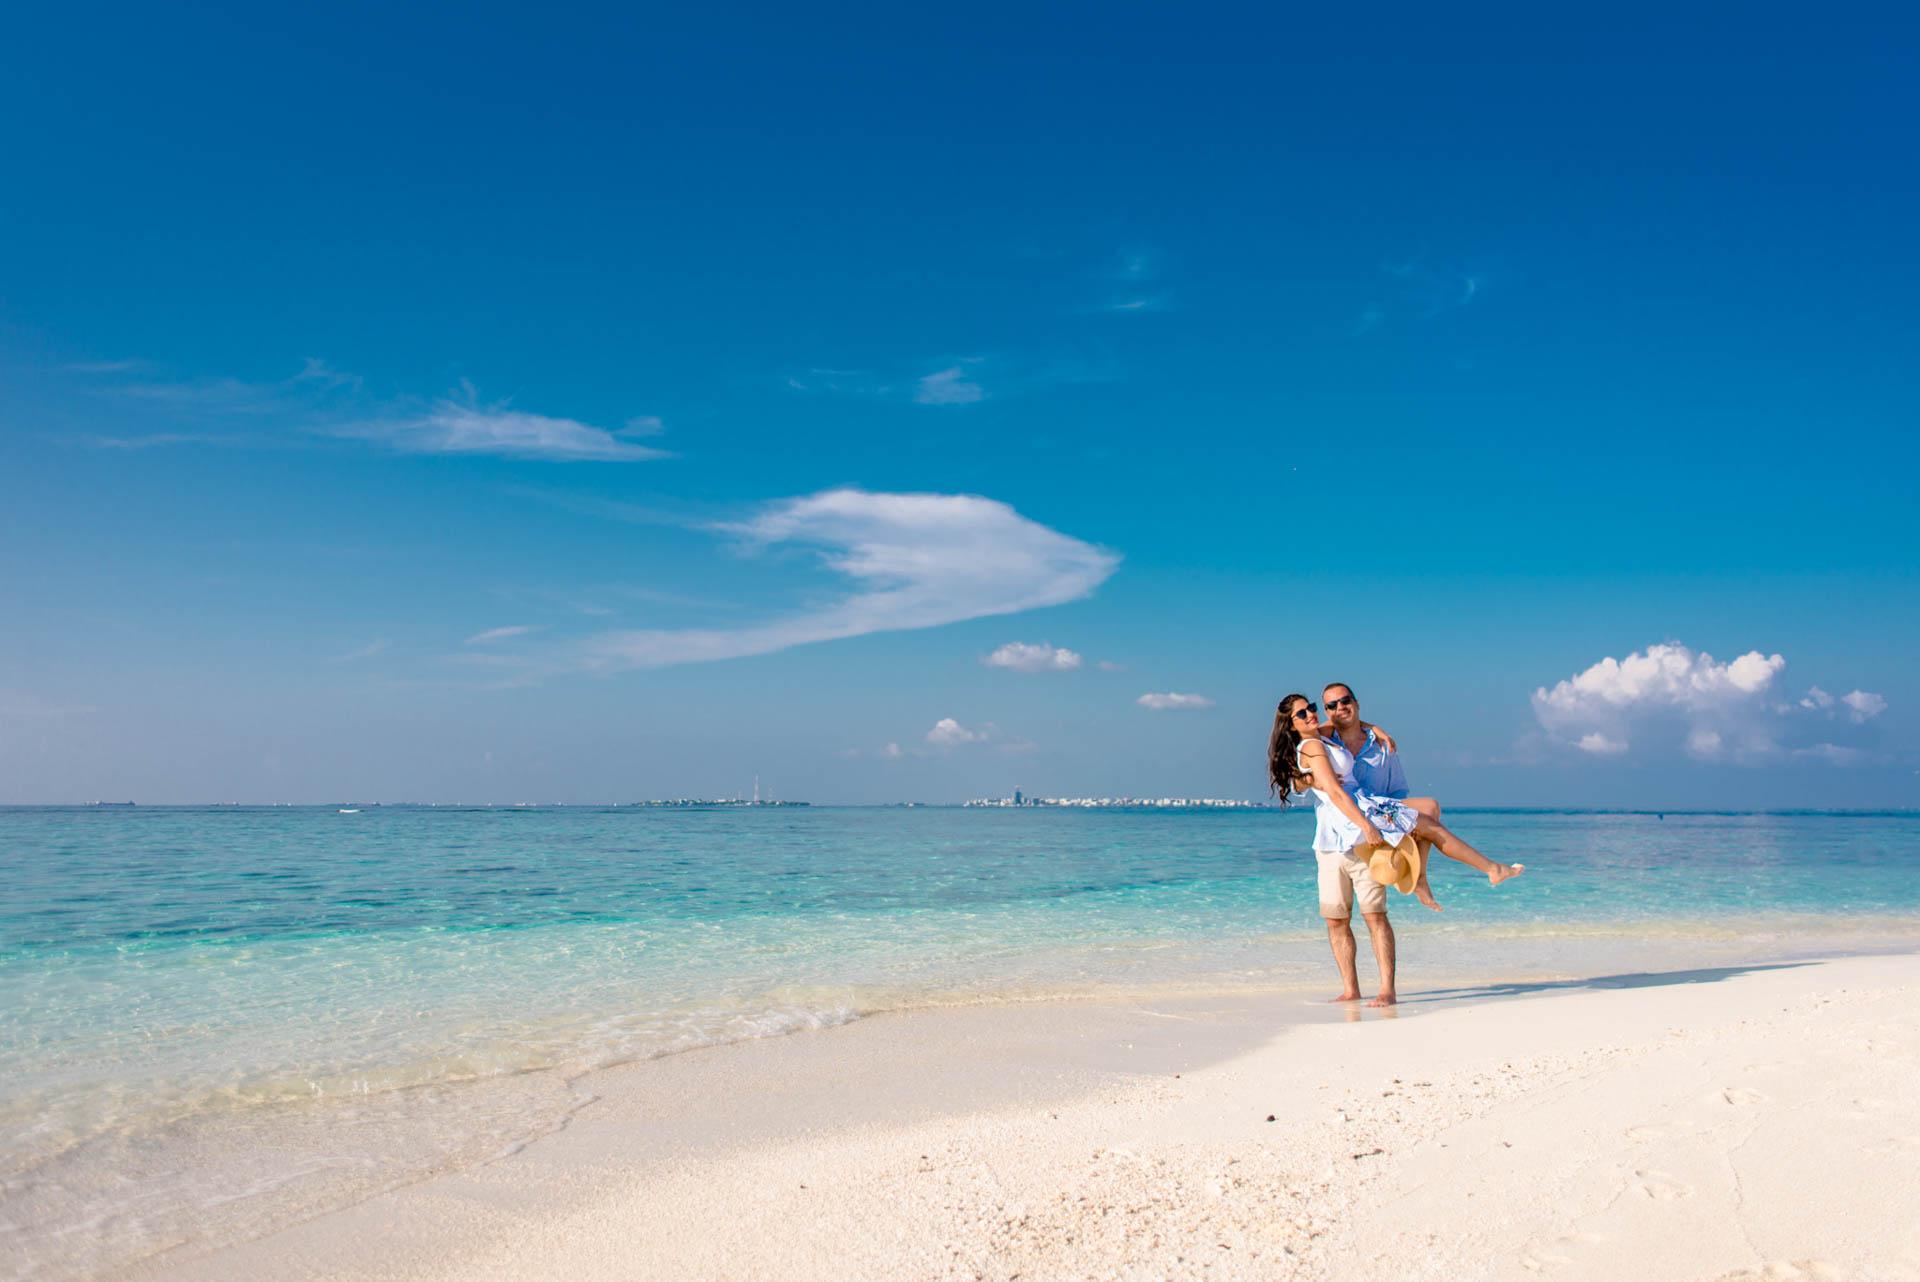 Shaidha Anthony at Vadoo Island Maldives 16